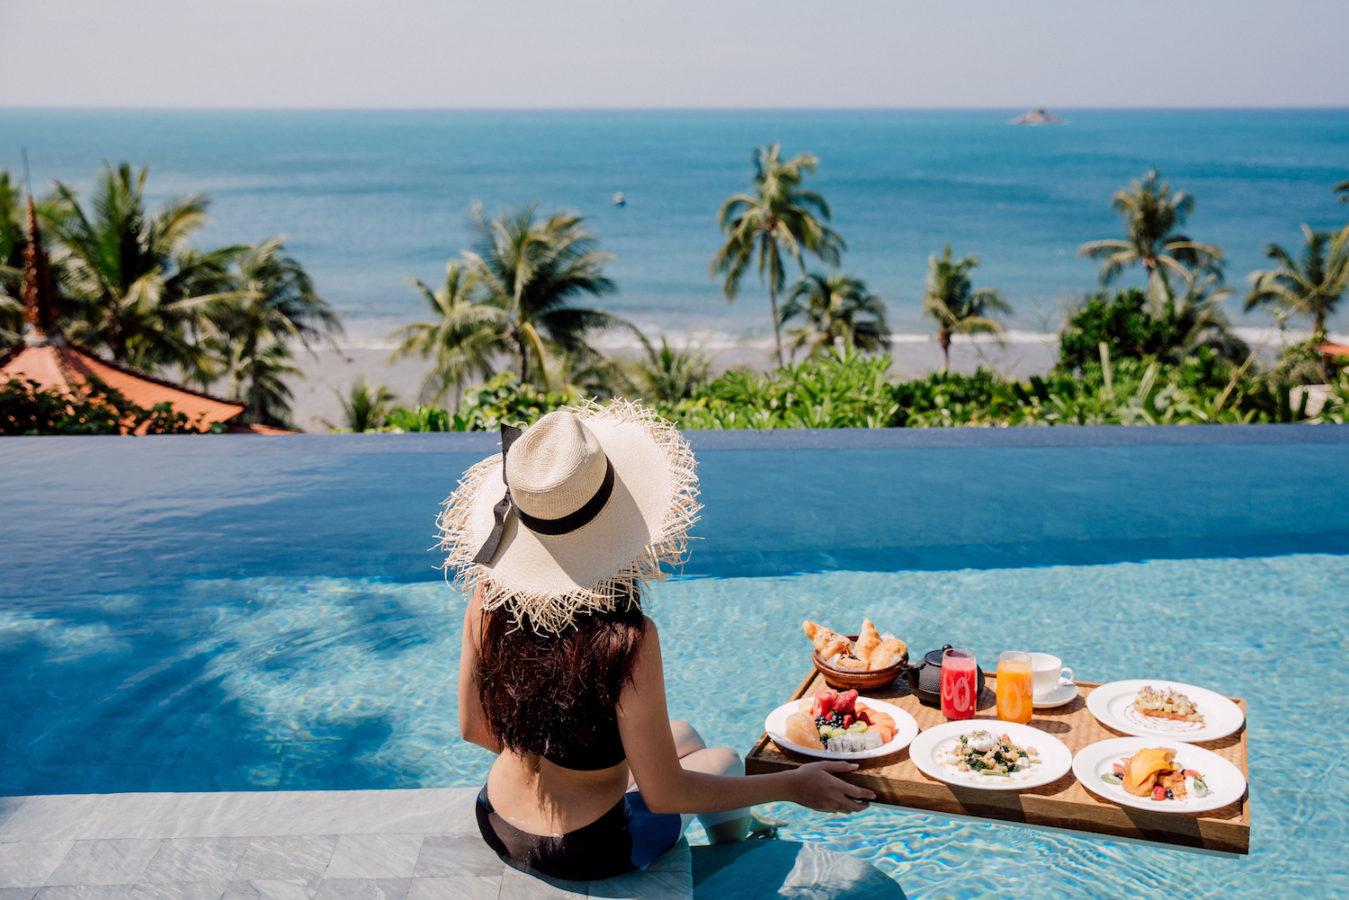 Indulge in a Spectacular Gastronomic Getaway Weekend at Trisara in Phuket